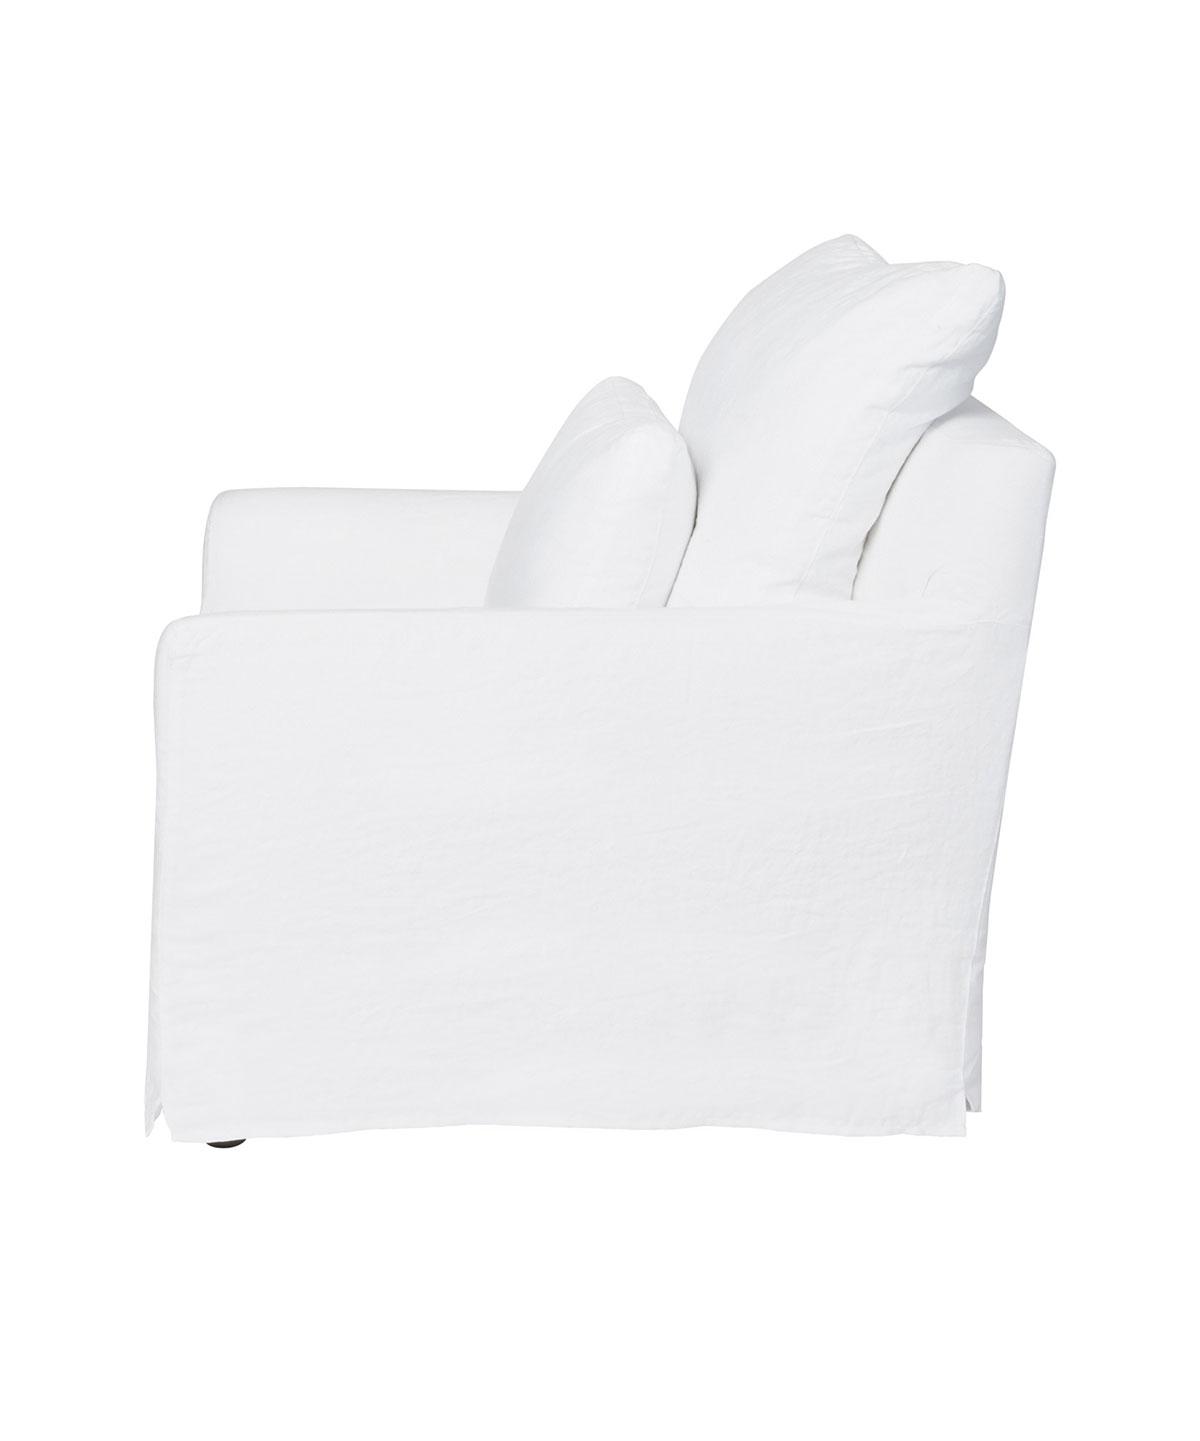 Donato Slipcovered Chair